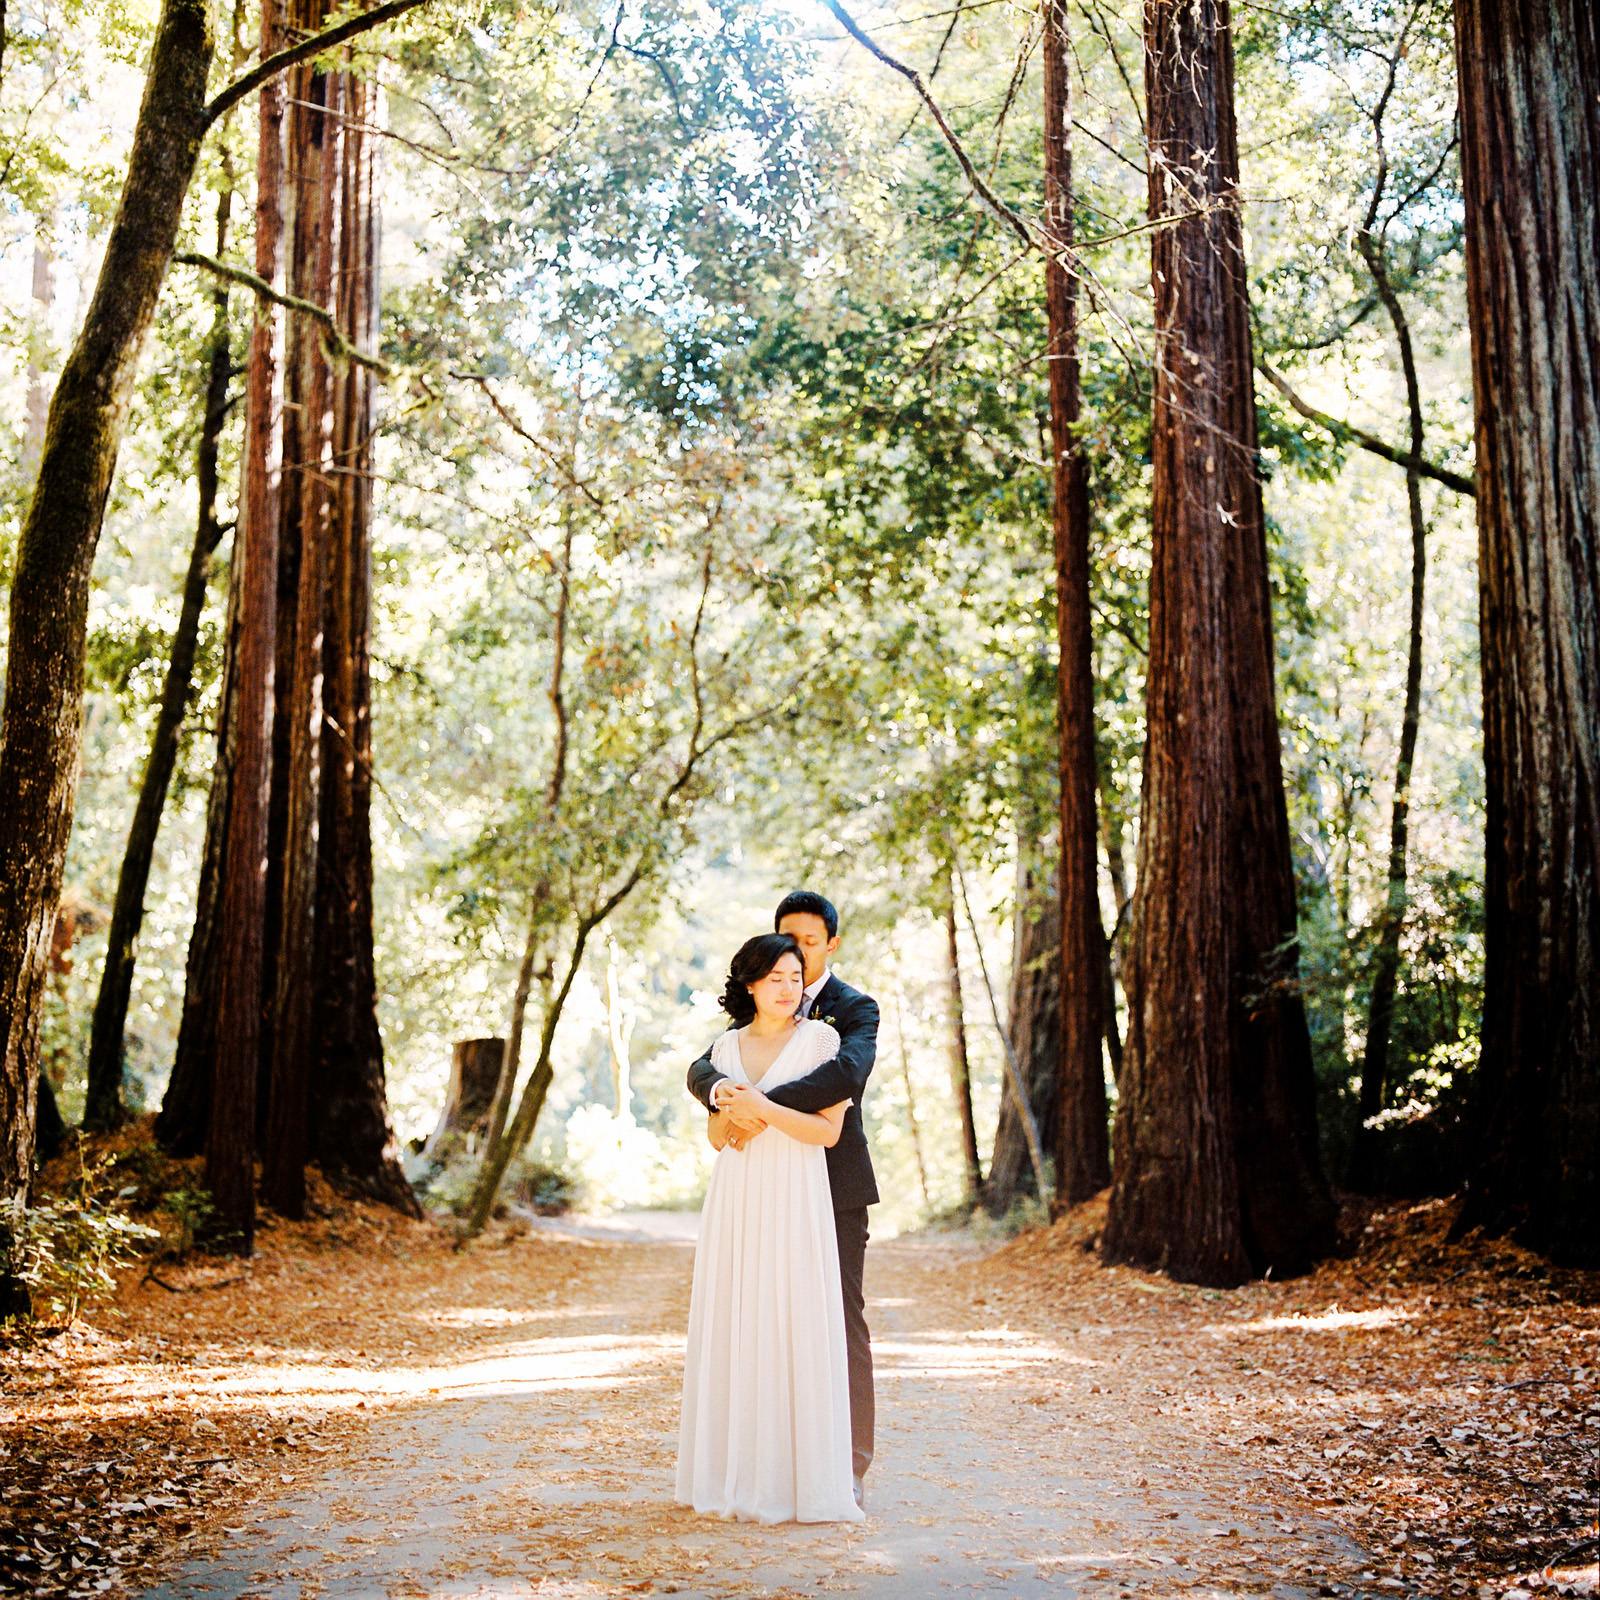 kimclay-blog-051 REDWOOD FOREST WEDDING